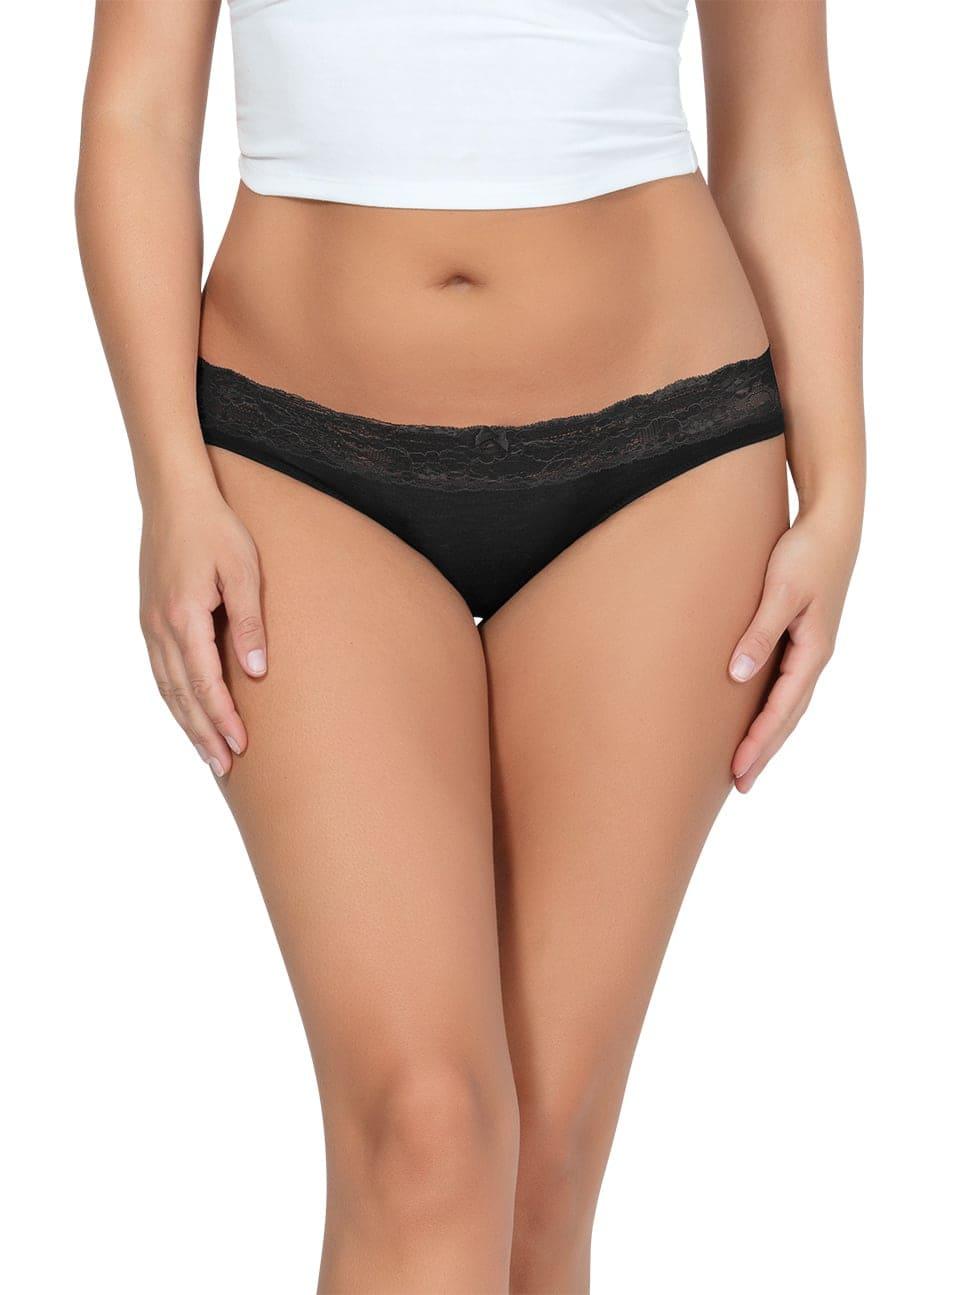 PARFAIT ParfaitPanty SoEssential BikiniPP303 Black Front close - Parfait Panty So Essential Bikini- Black - PP303